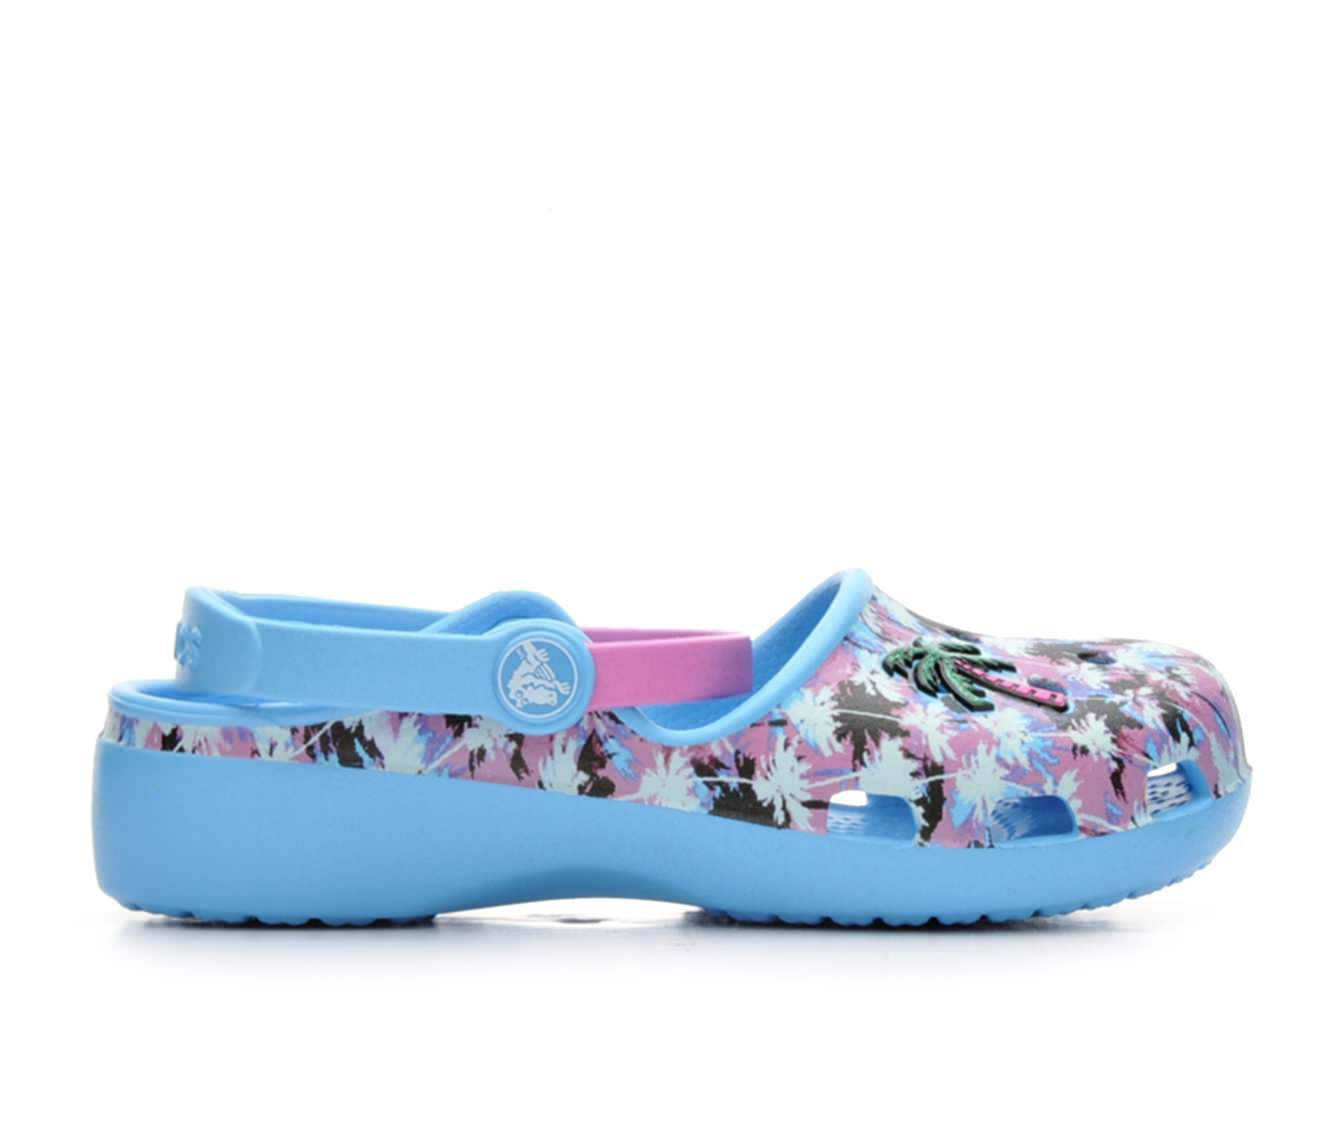 Girls' Crocs Karin Novelty Children's Shoes (Blue)